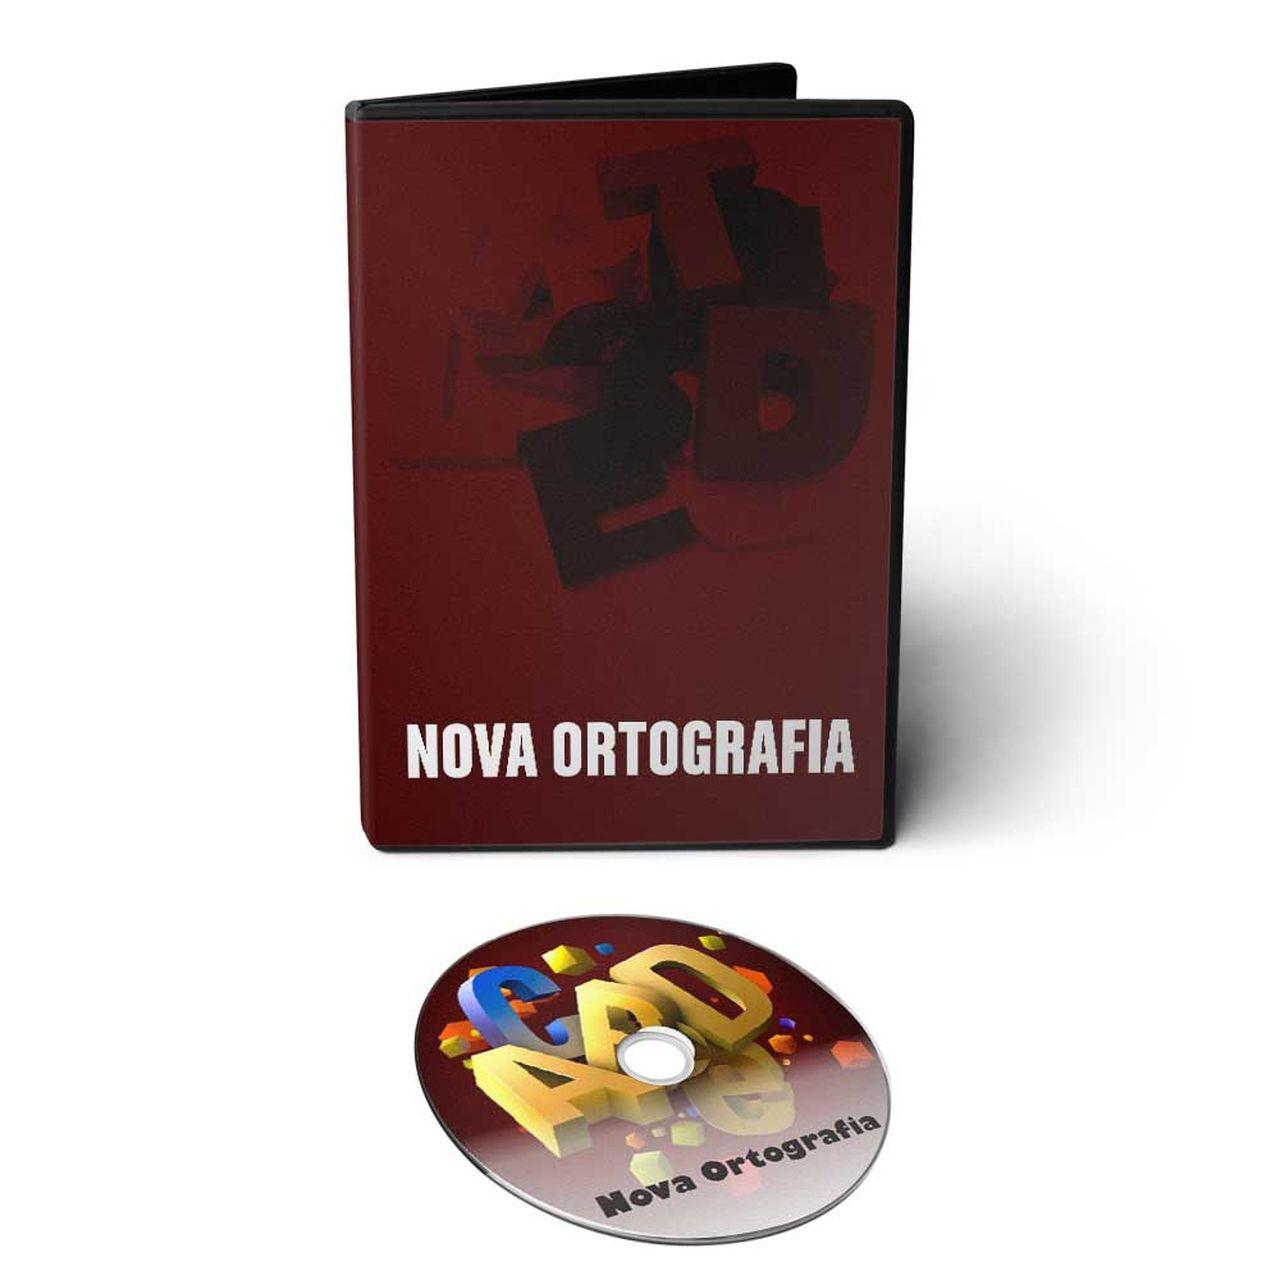 Curso sobre a Nova Ortografia da Língua Portuguesa em DVD Videoaula